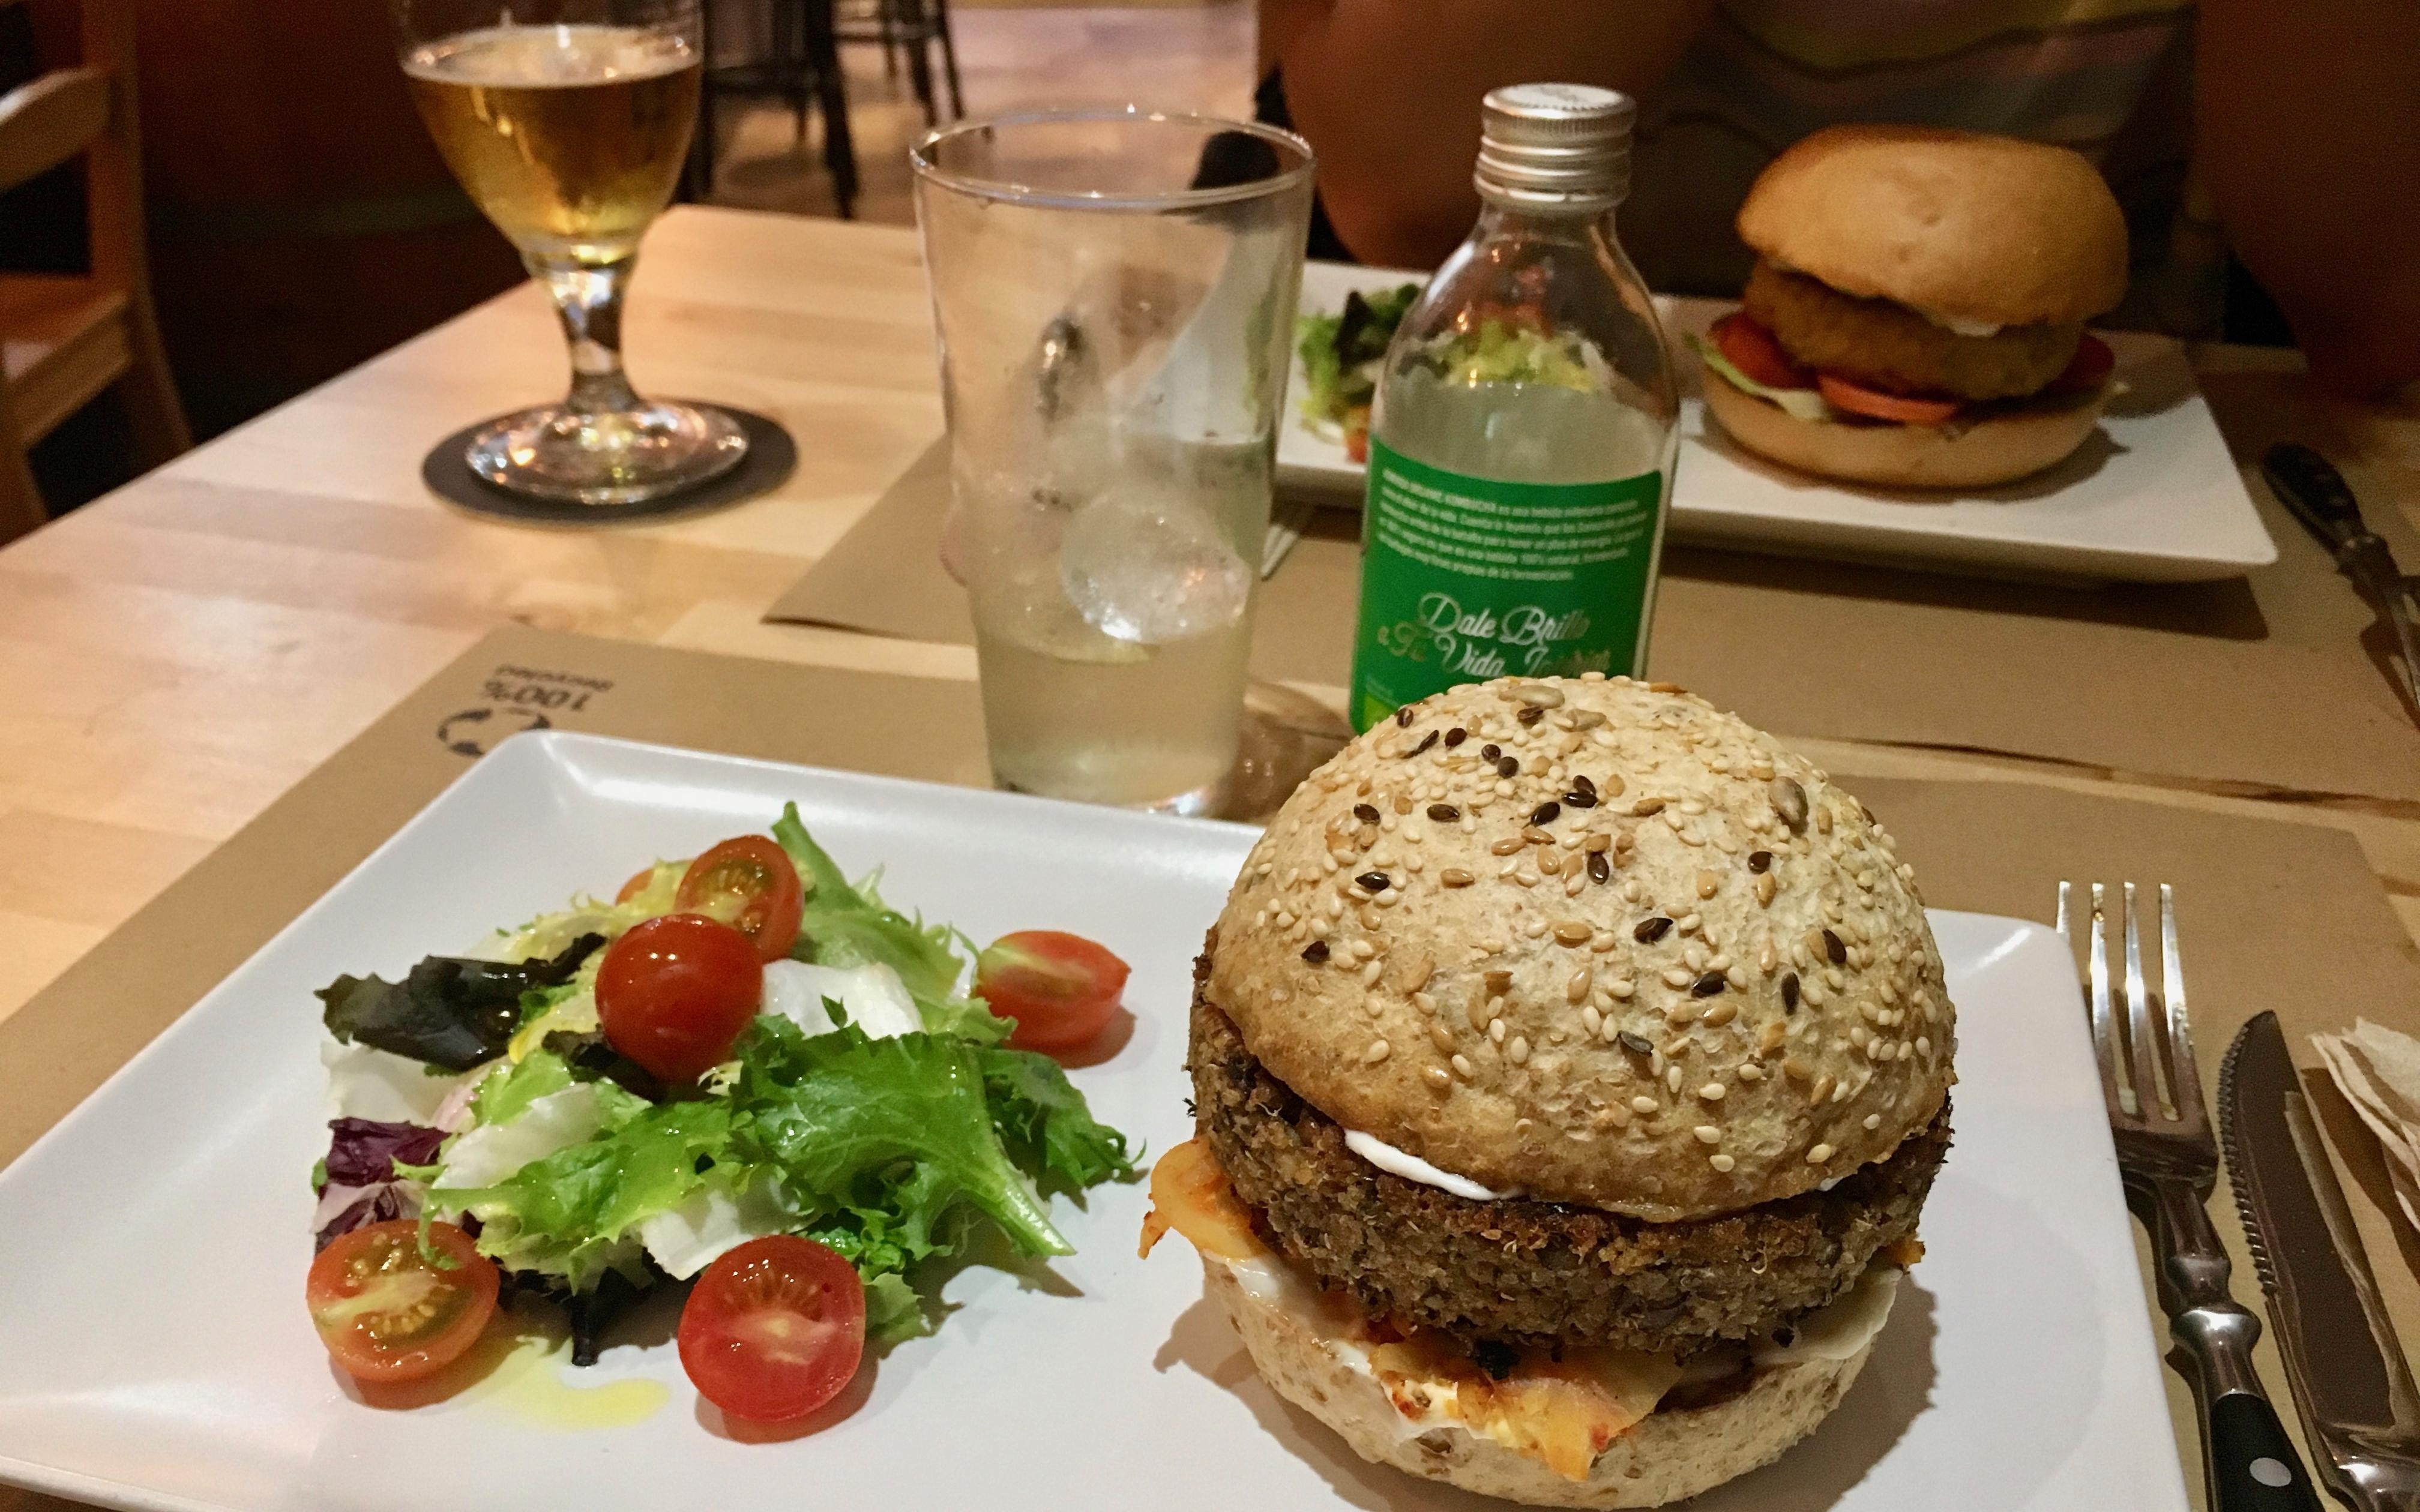 Melocotón Vegan Burger: el nuevo templo de la hamburguesa vegana en Barcelona